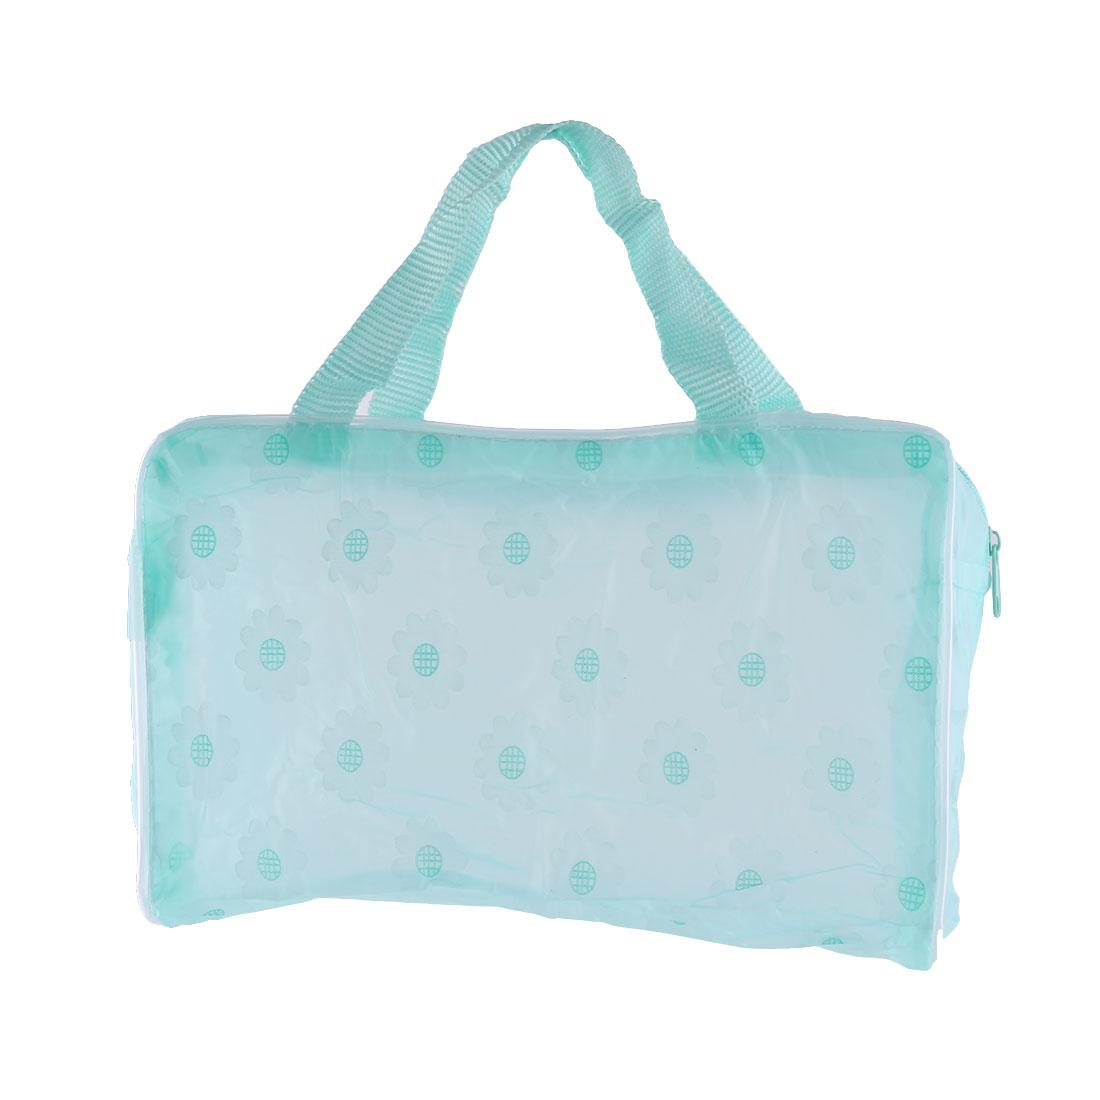 Travel PVC Flower Pattern Zipper Closure Cosmetics Storage Wash Bag Green